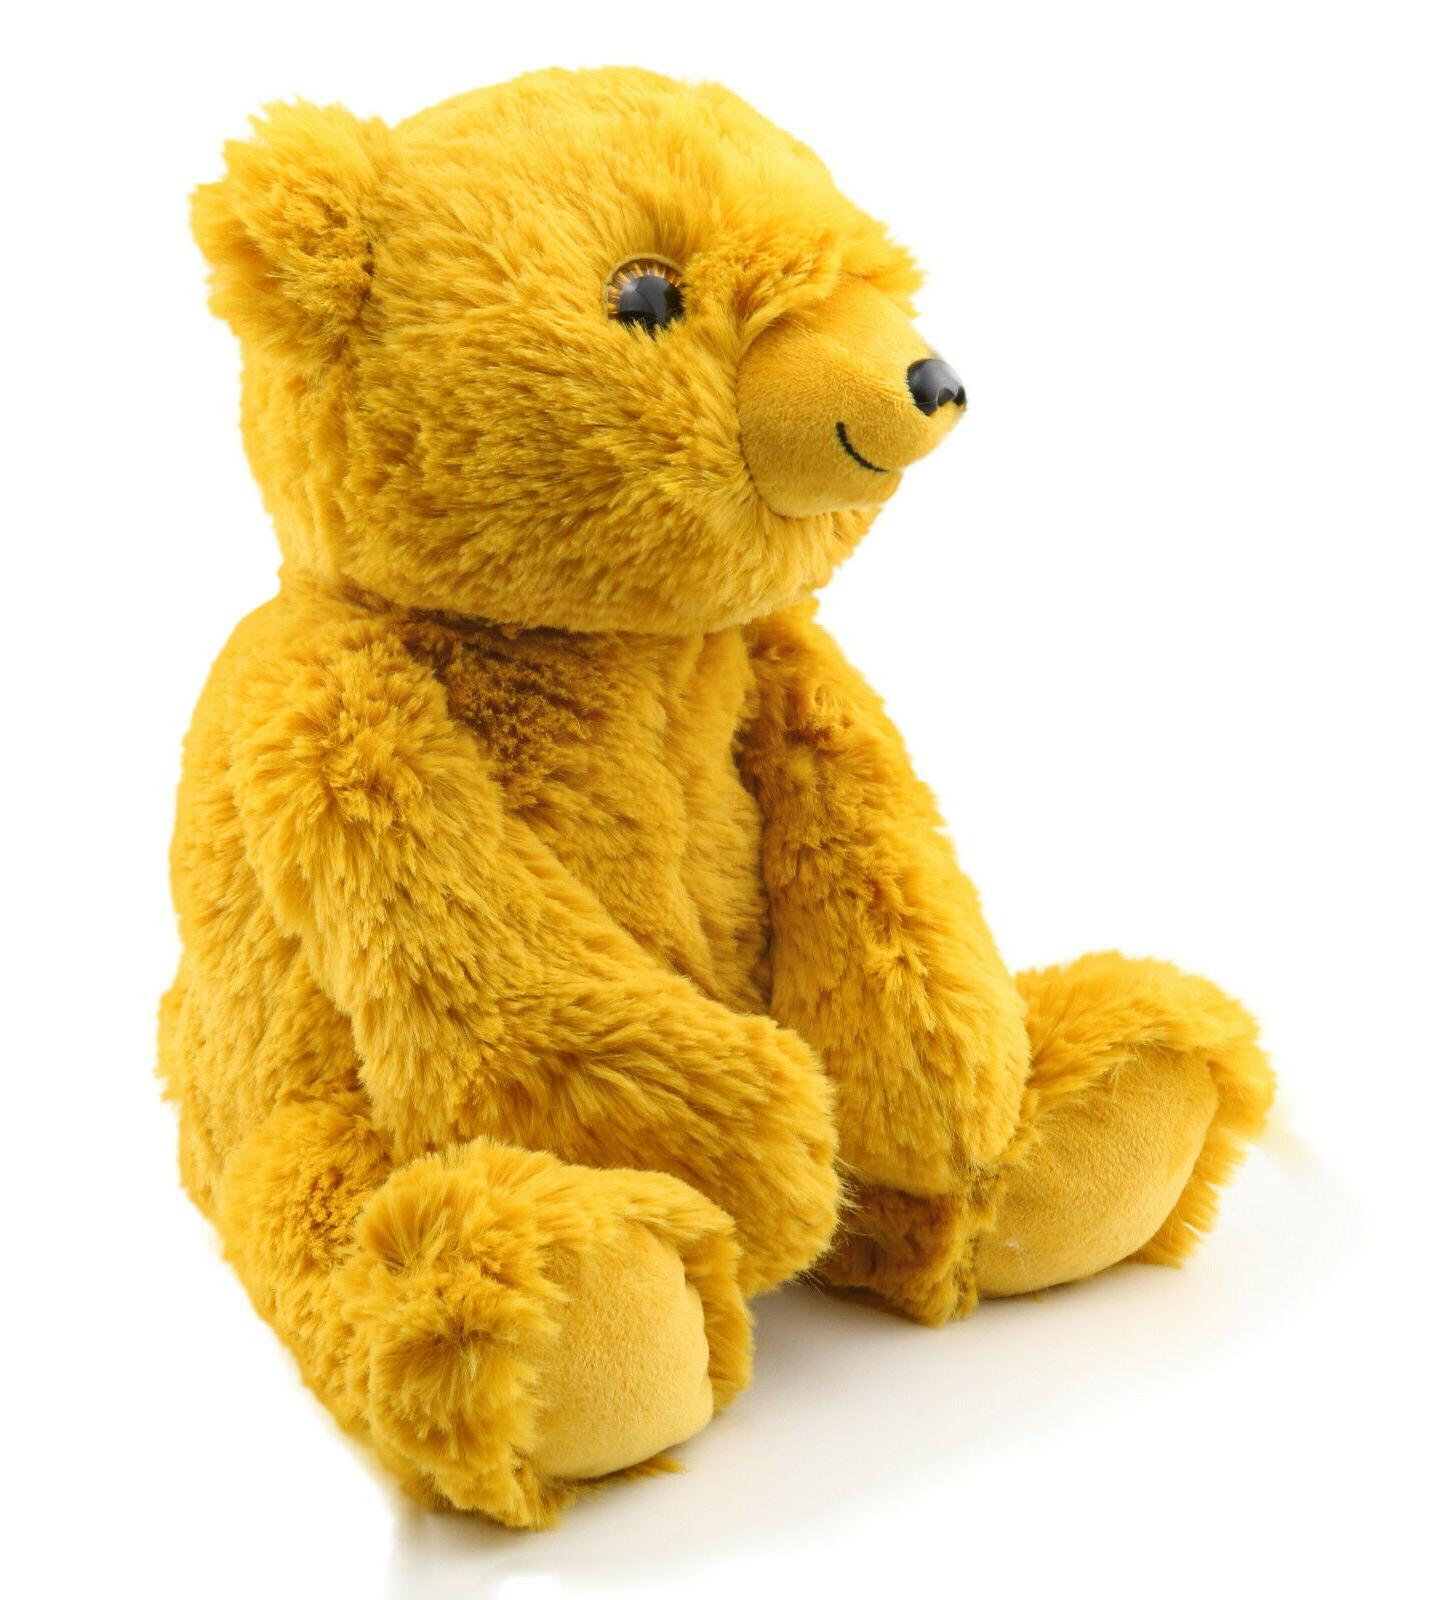 Plush Bear Toy - Cute - ICE BEAR